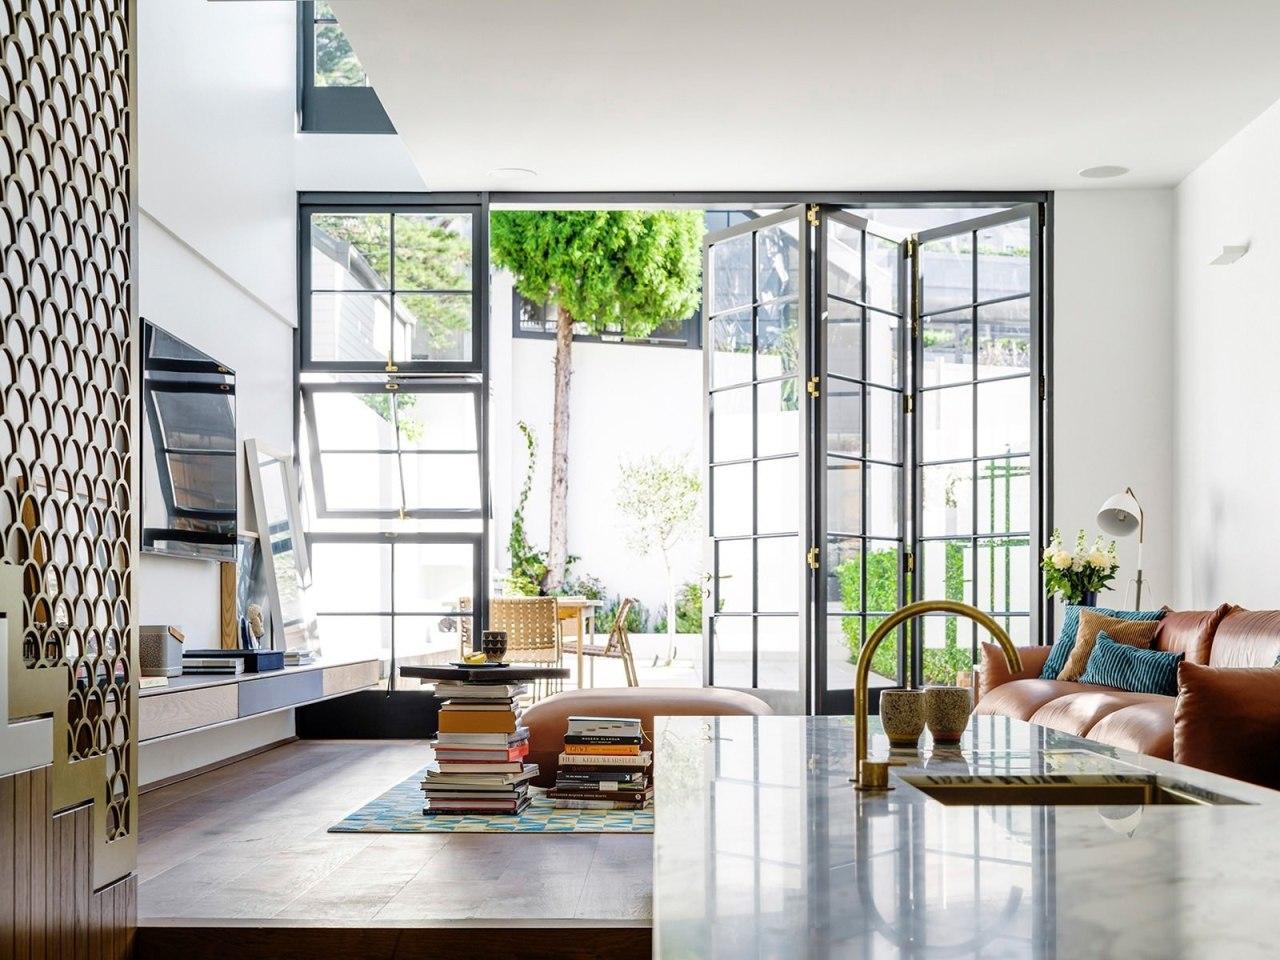 Architect: Luigi Rosselli. Photography by Justin Alexander, Sean condominium, daylighting, home, interior design, living room, loft, window, white